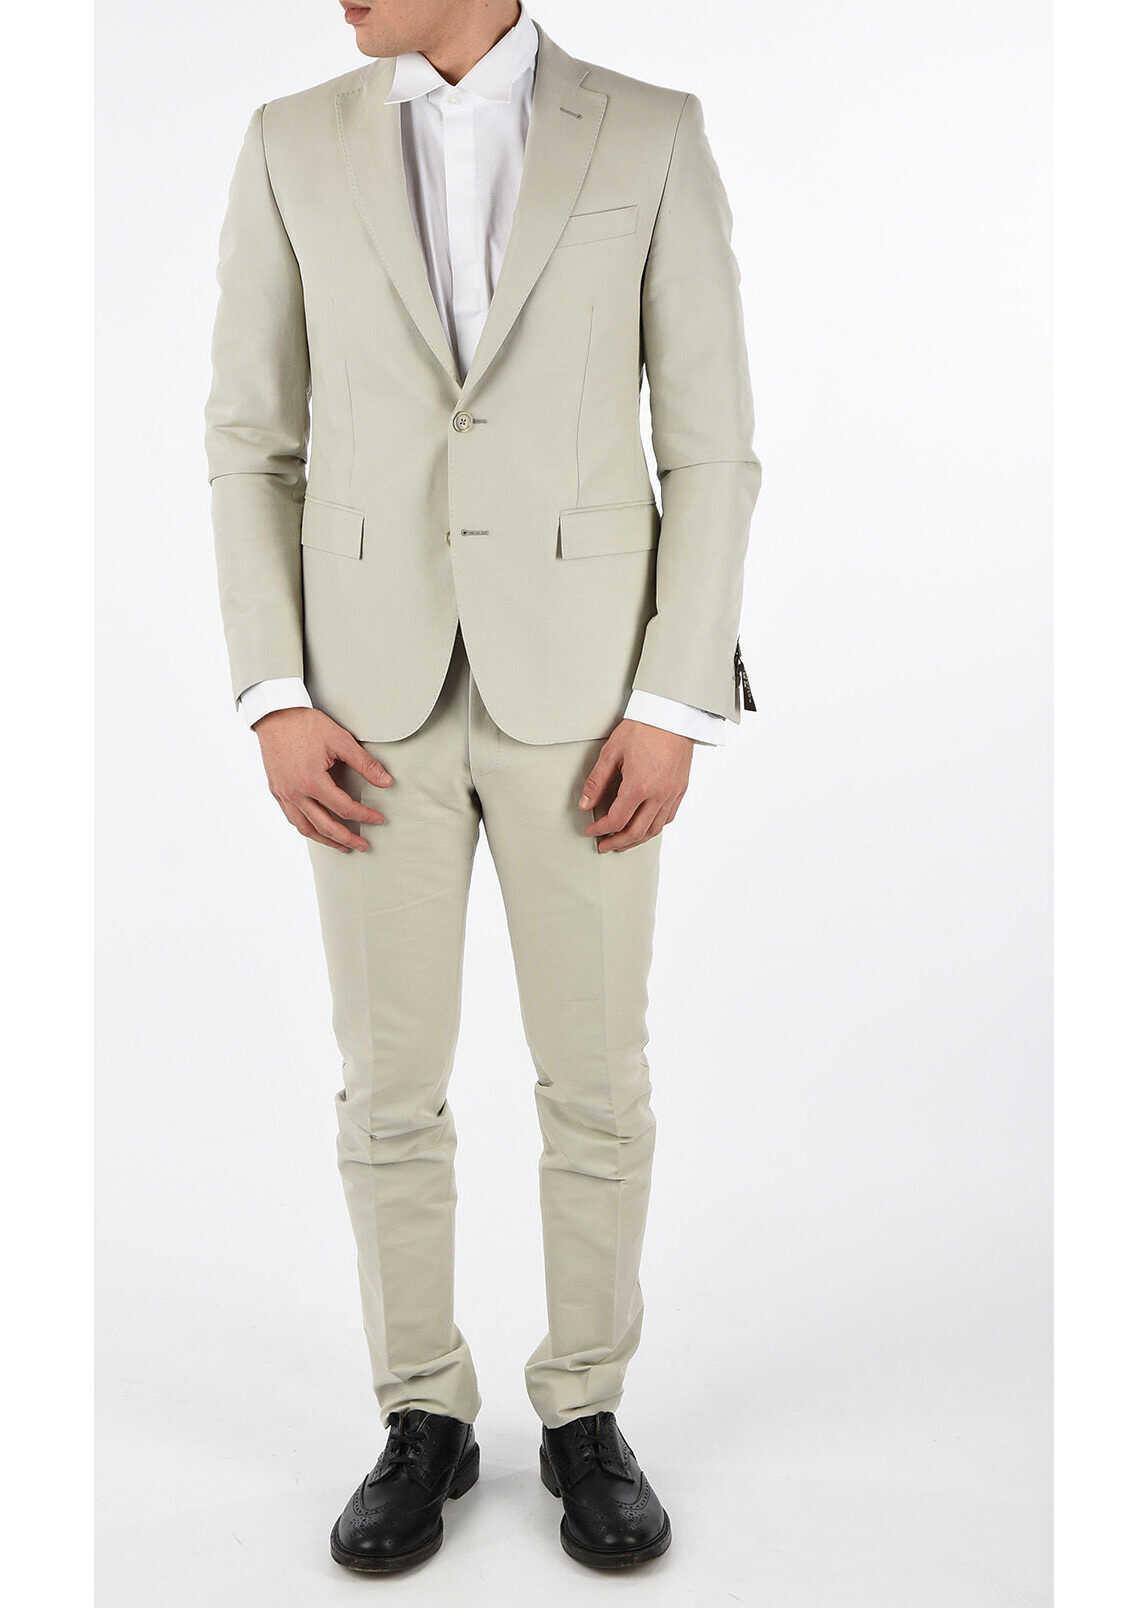 CORNELIANI CC COLLECTION 2 Button RESET Suit BEIGE imagine